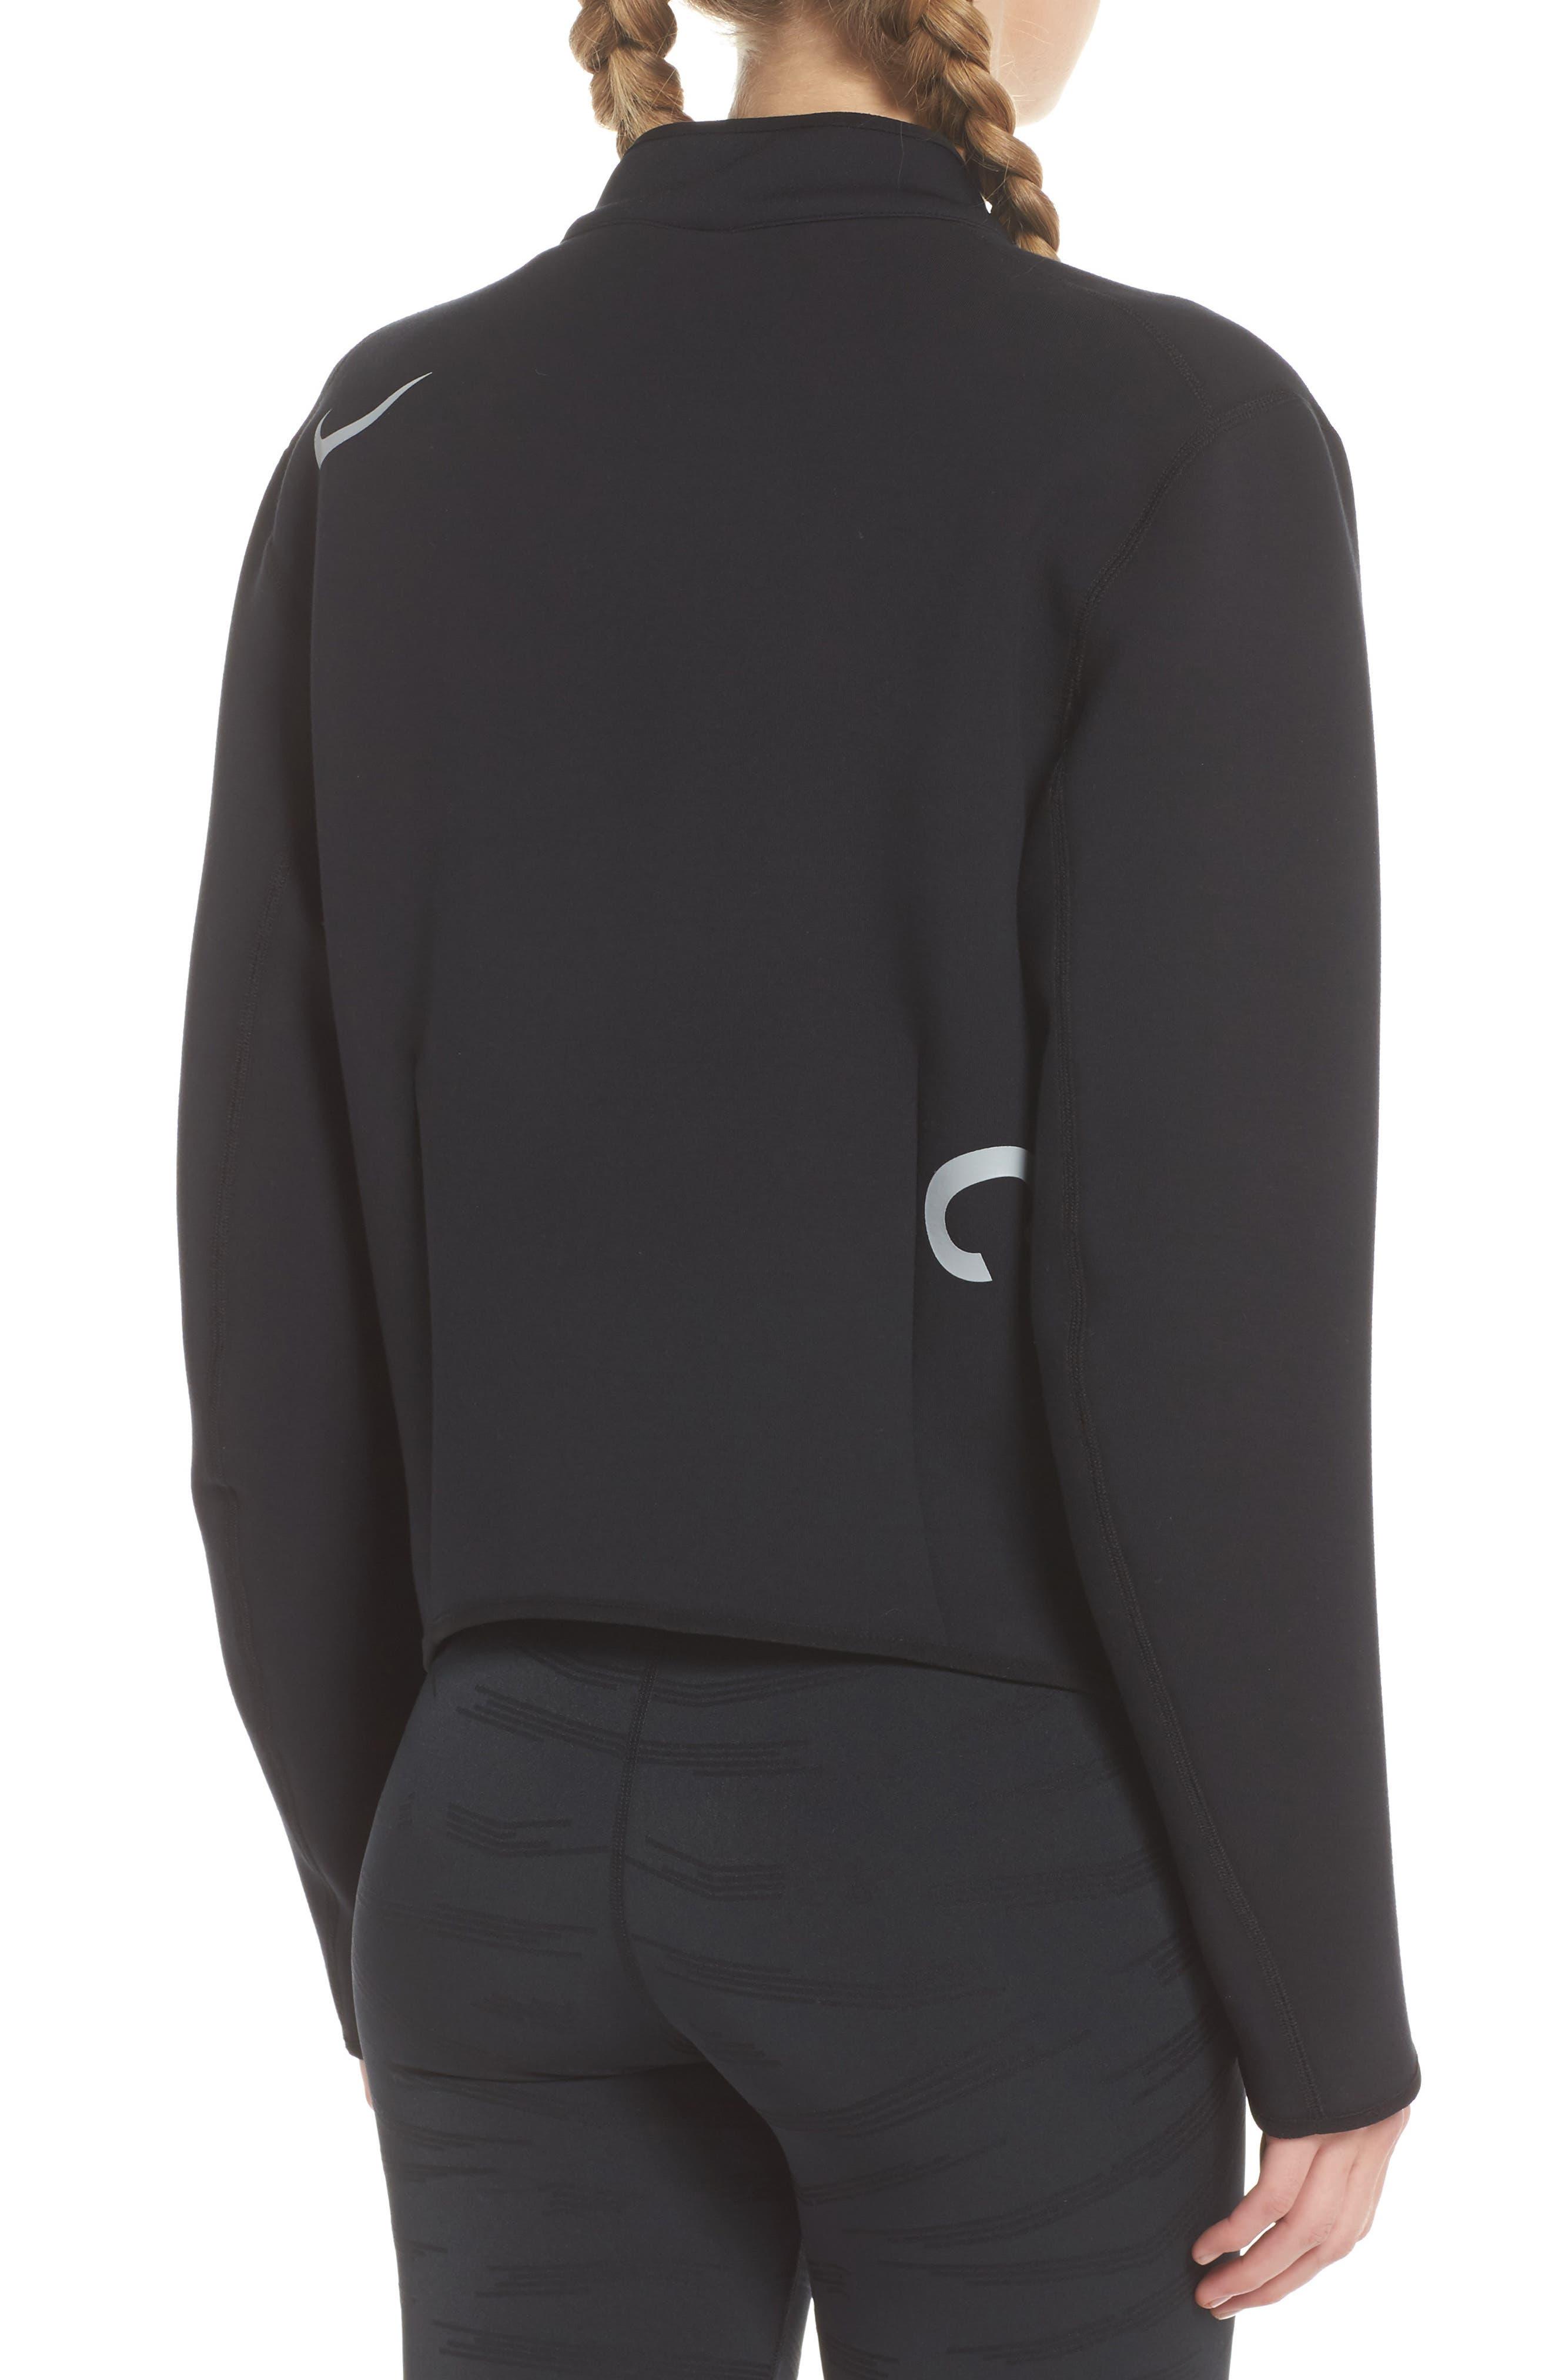 Alternate Image 2  - Nike NikeLab ACG Fleece Women's Crewneck Top